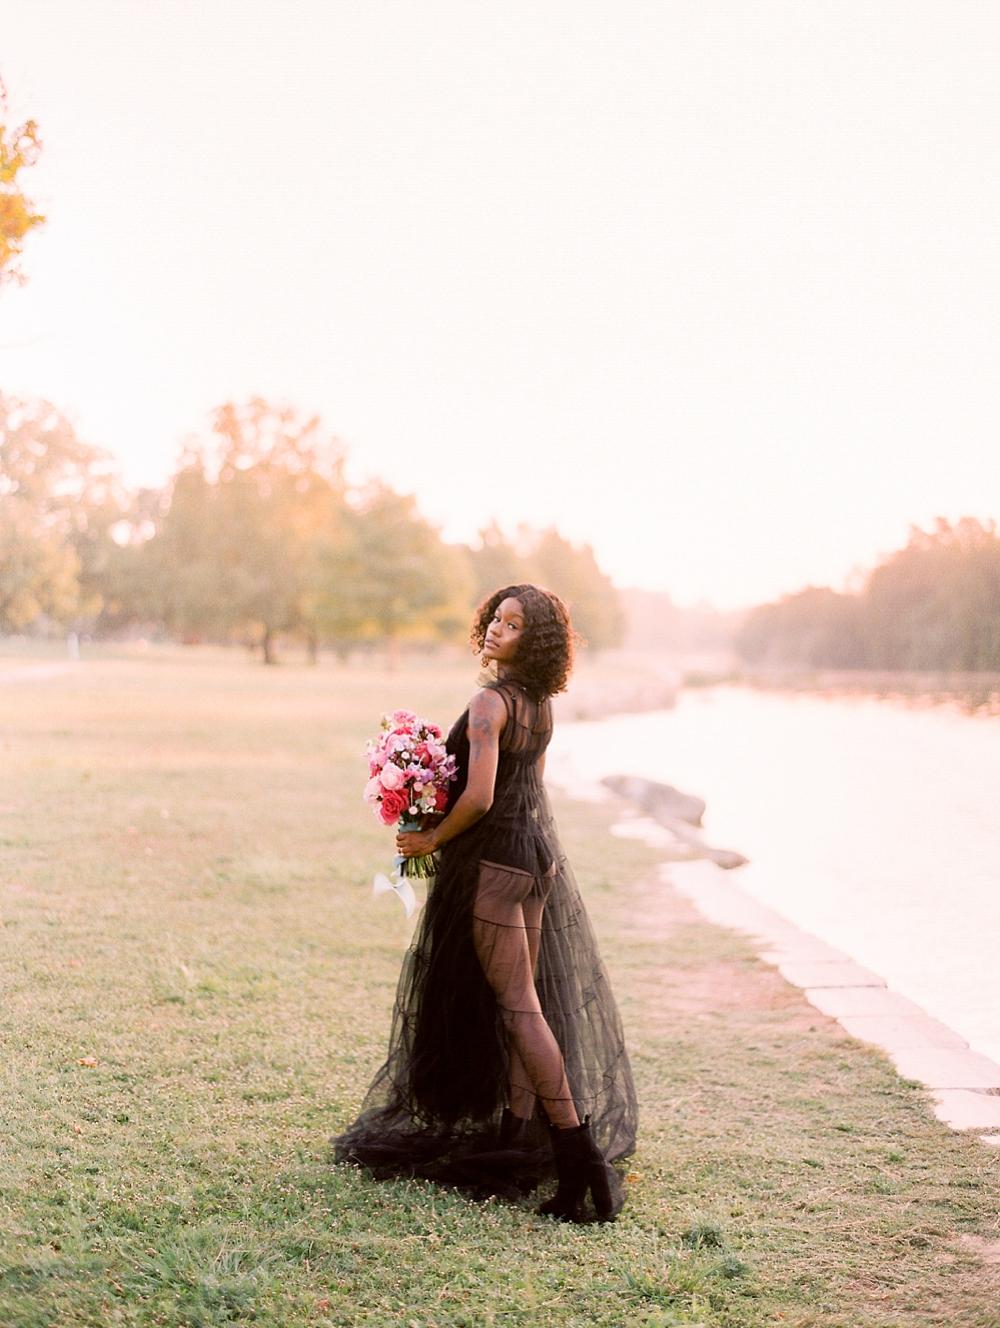 kristin-la-voie-photography-AUSTIN-wedding-BOUDOIR-photographer-21